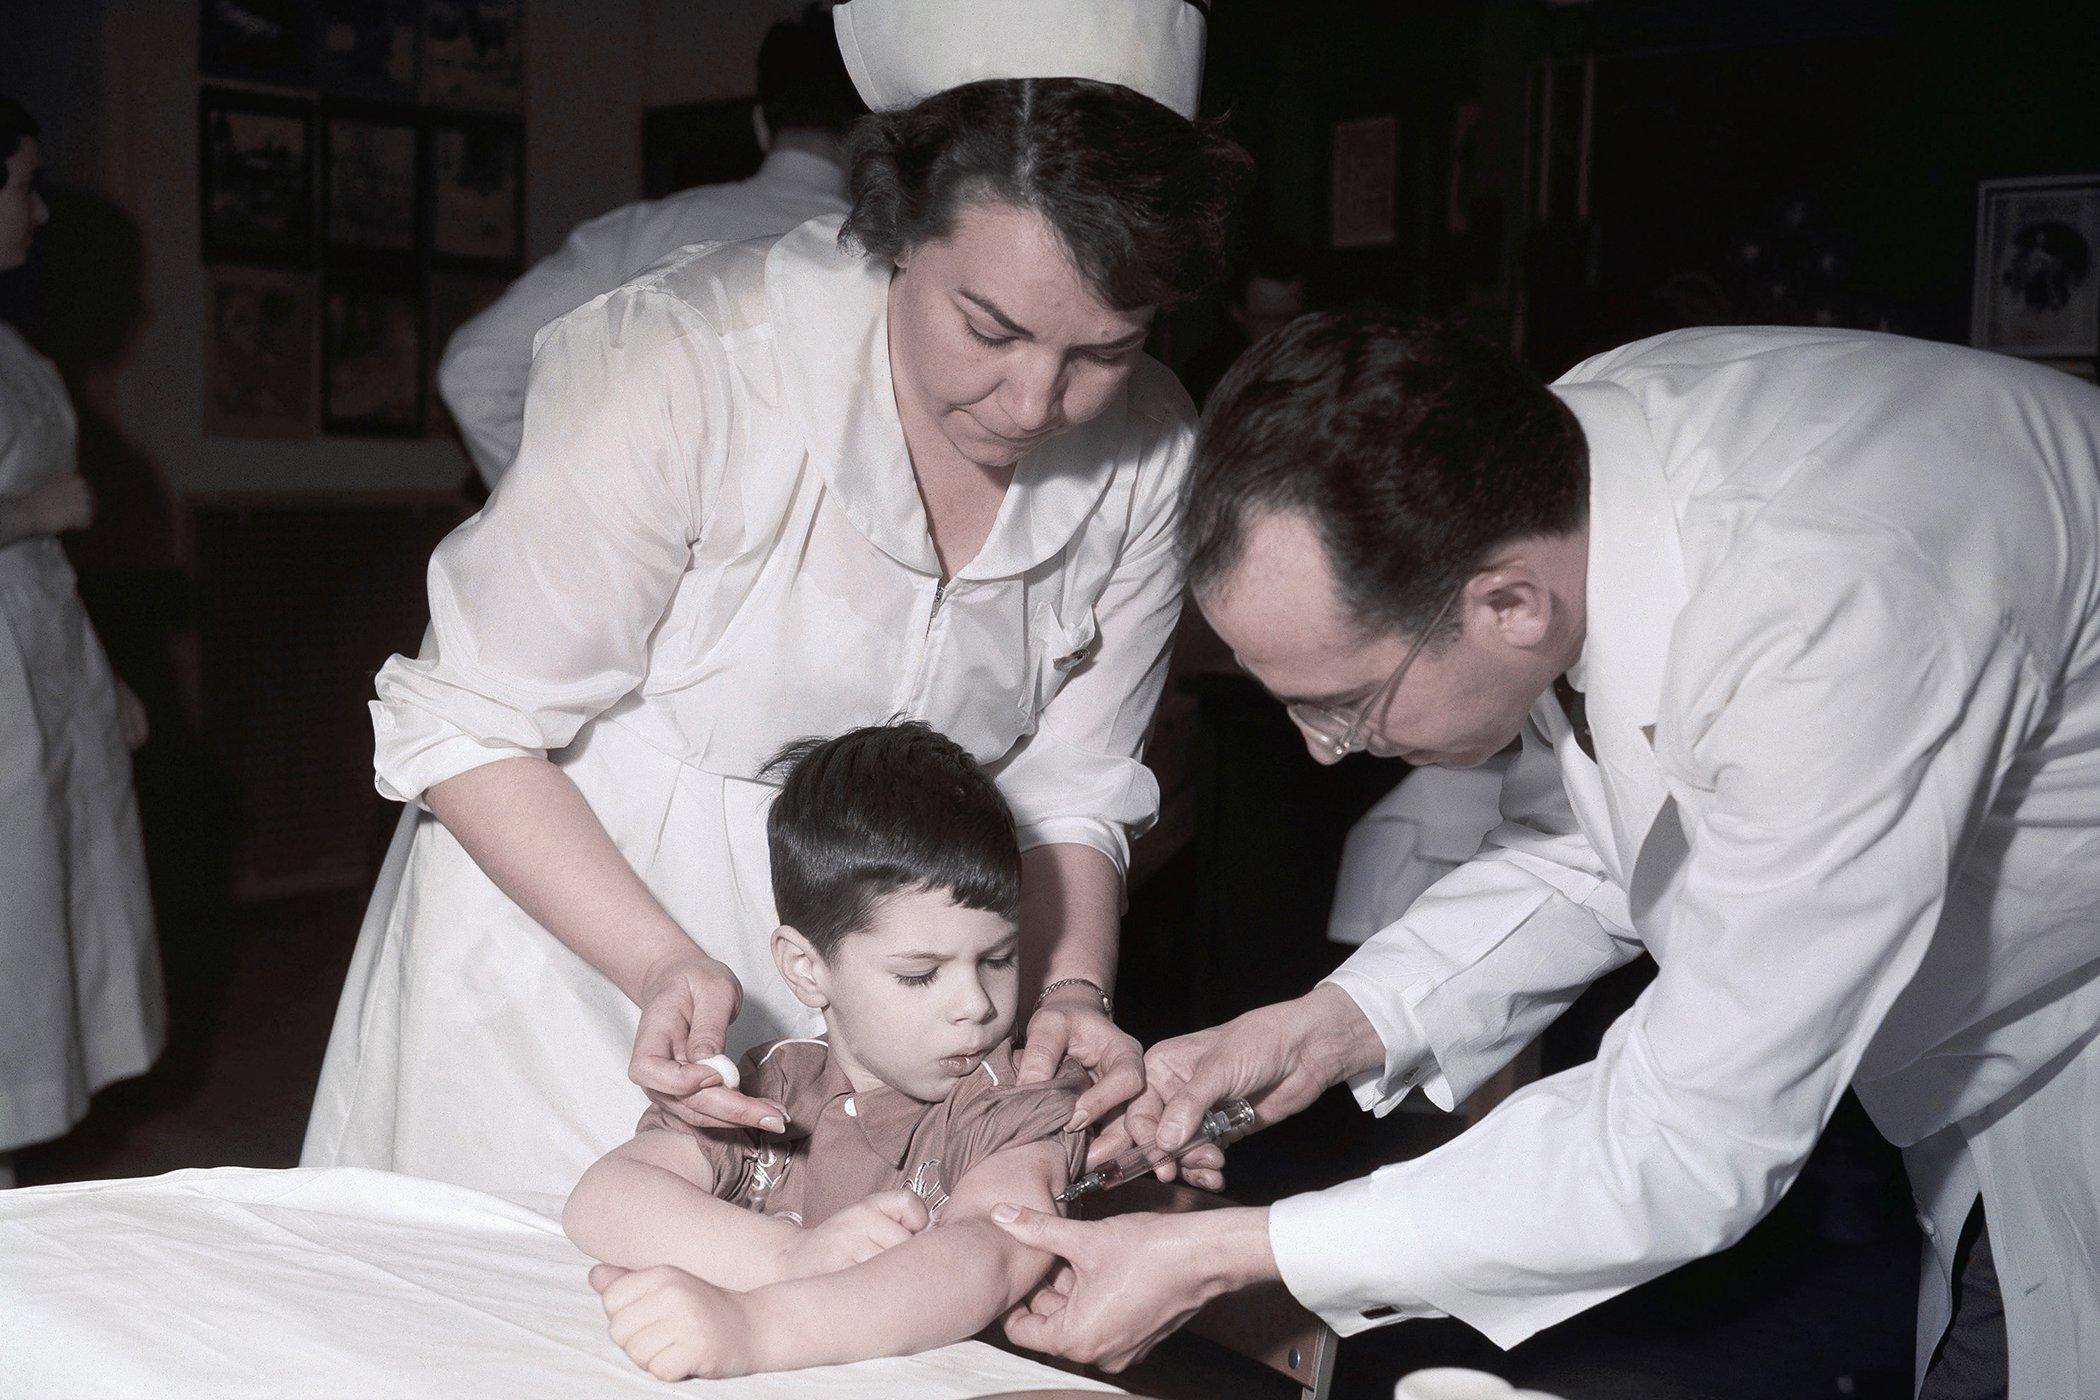 History-of-Pandemics-Polio-Vaccine.jpg